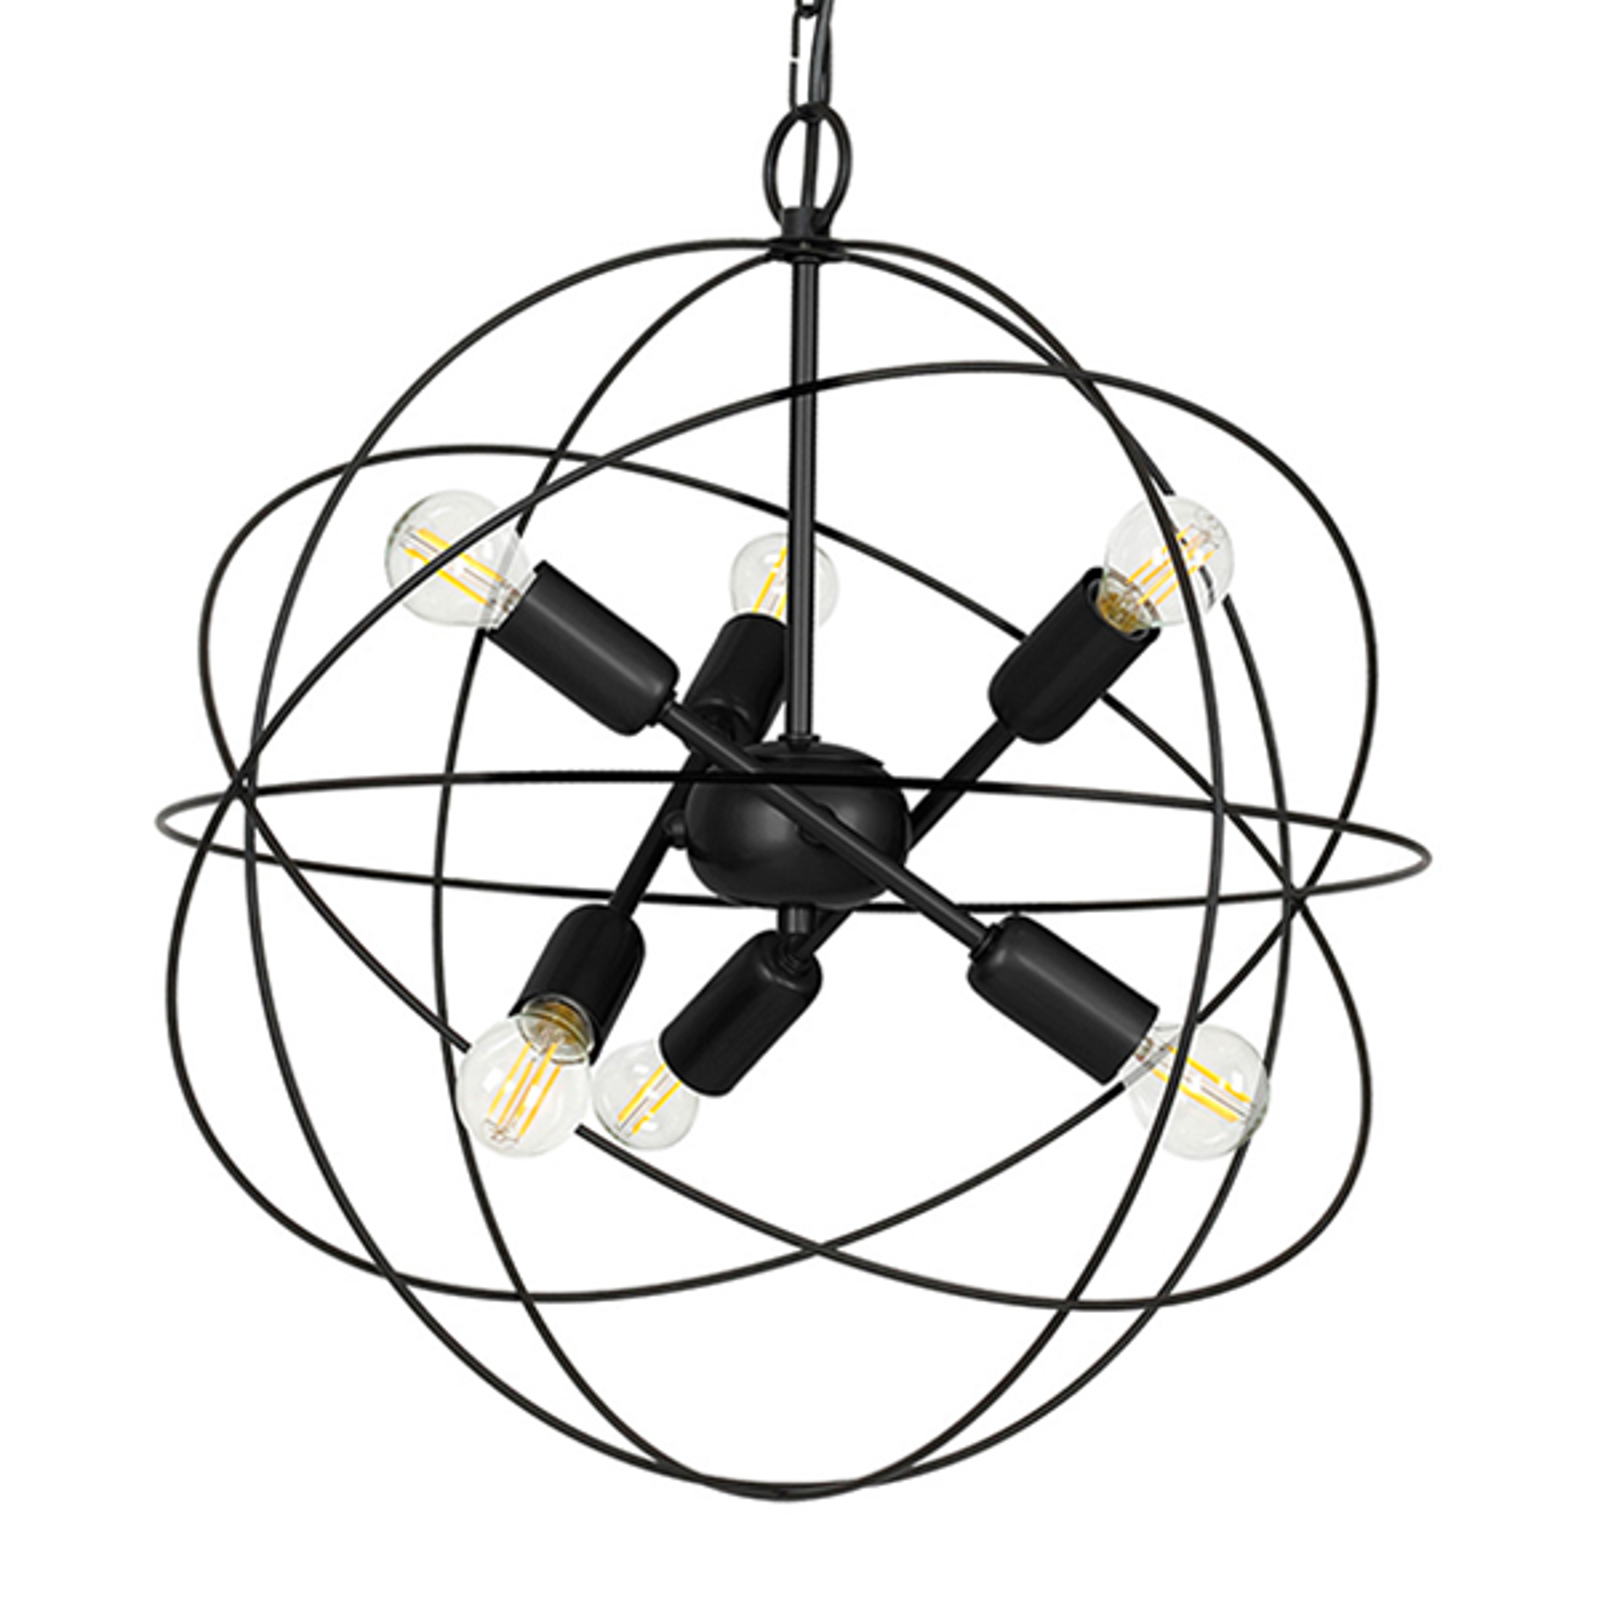 Lampa wisząca Copernicus, 6-punktowa czarna